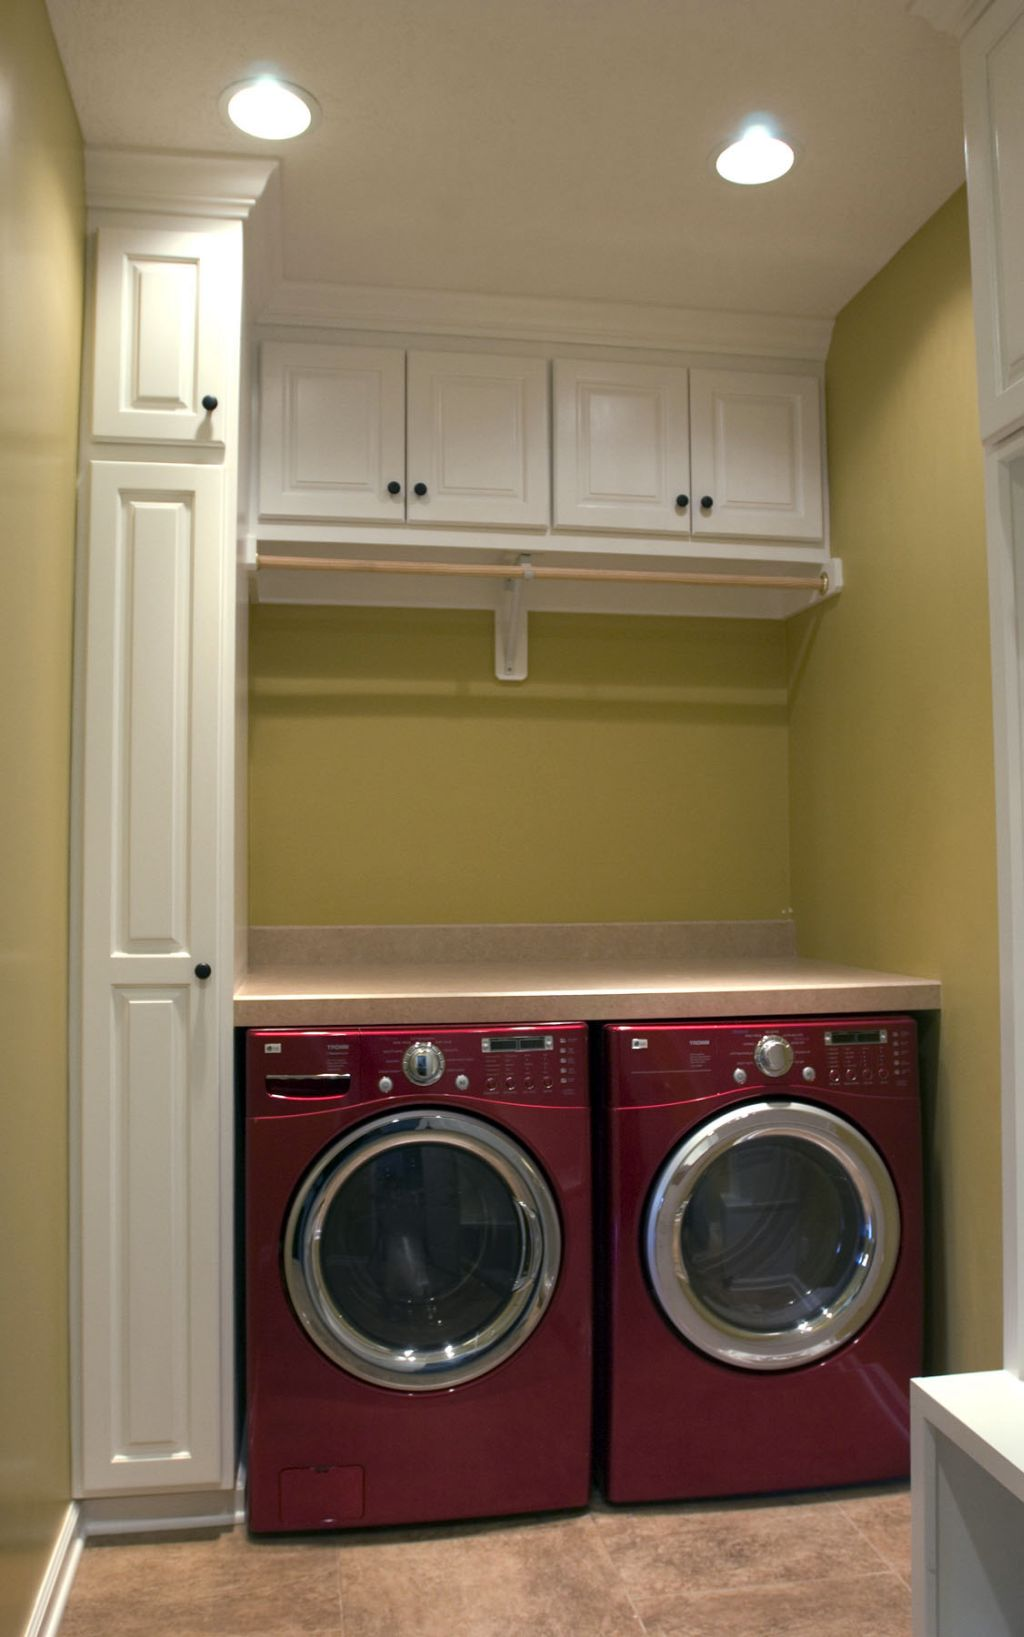 20 Briliant Small Laundry Room Storage Solutions on Laundry Cabinet Ideas  id=69637